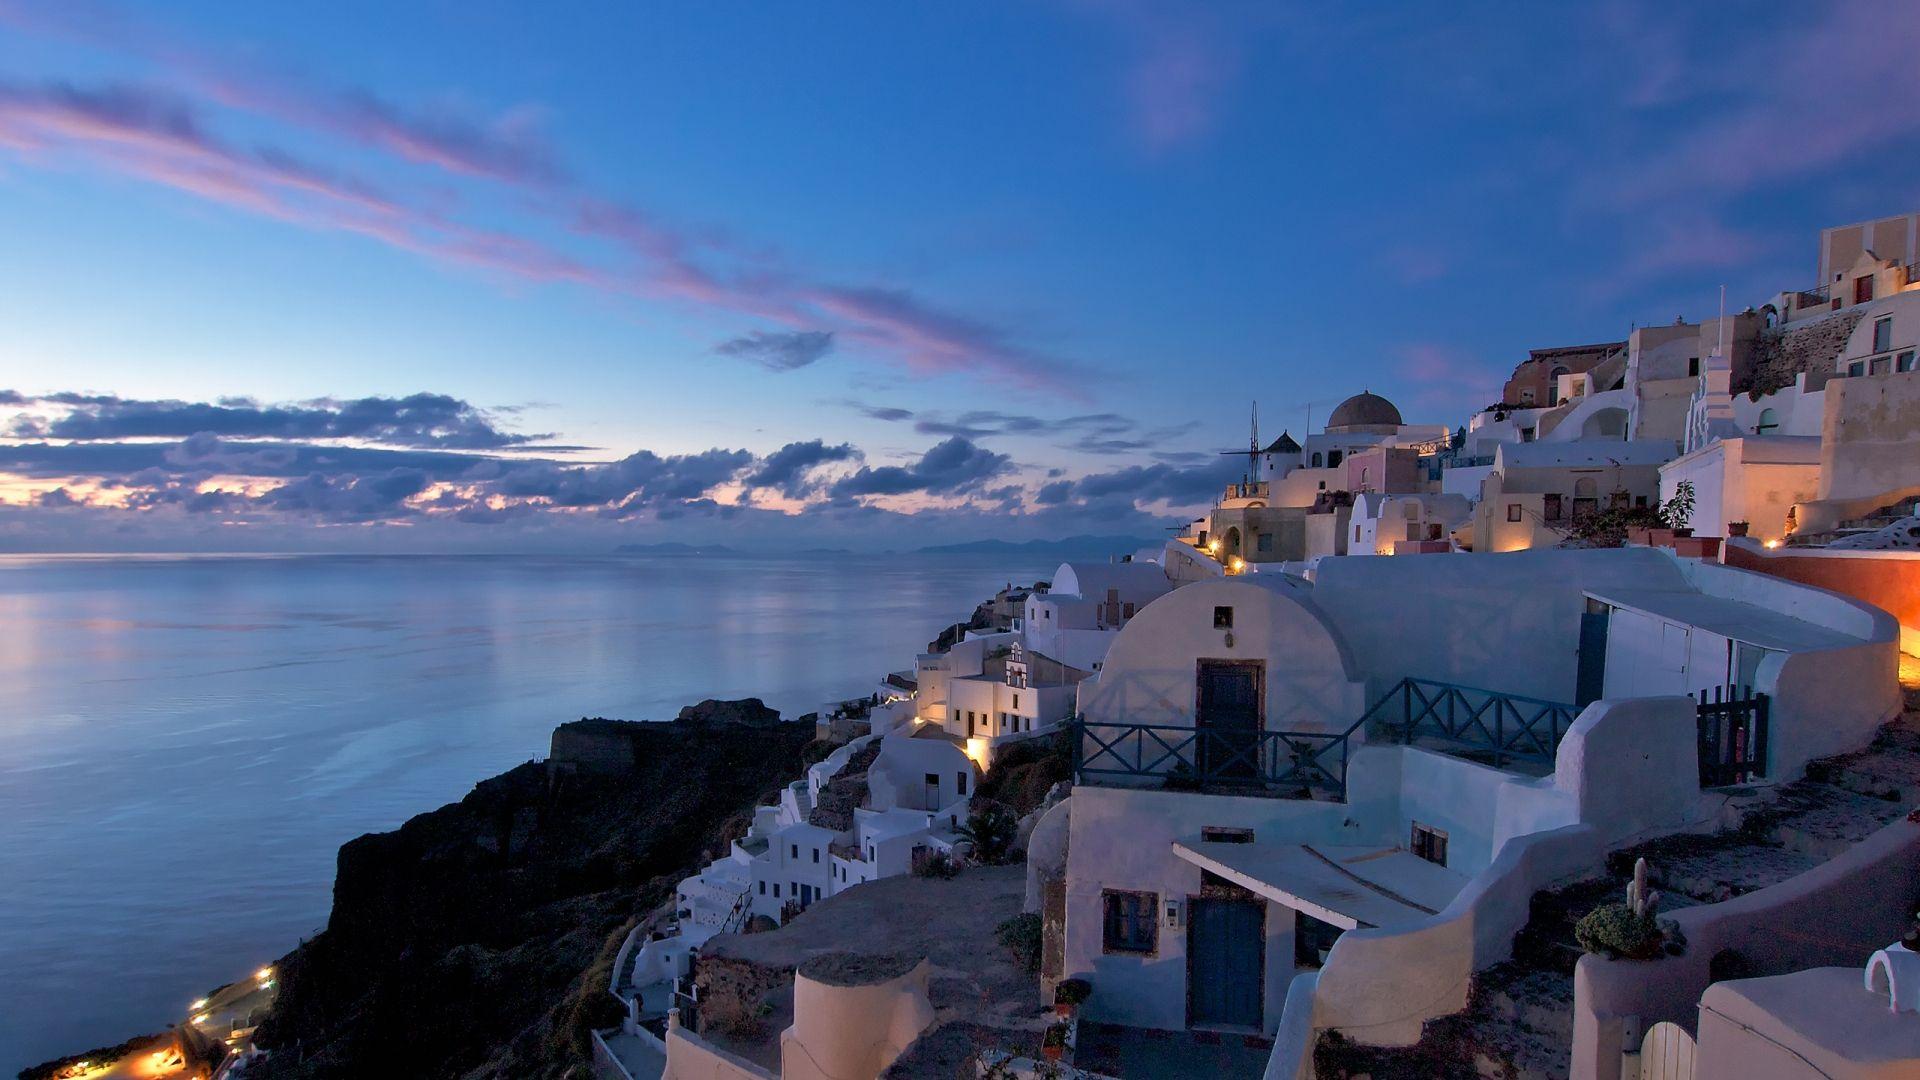 Santorini-Greece-wallpaper-hd-free-download-background-City.jpg (1920×1080)